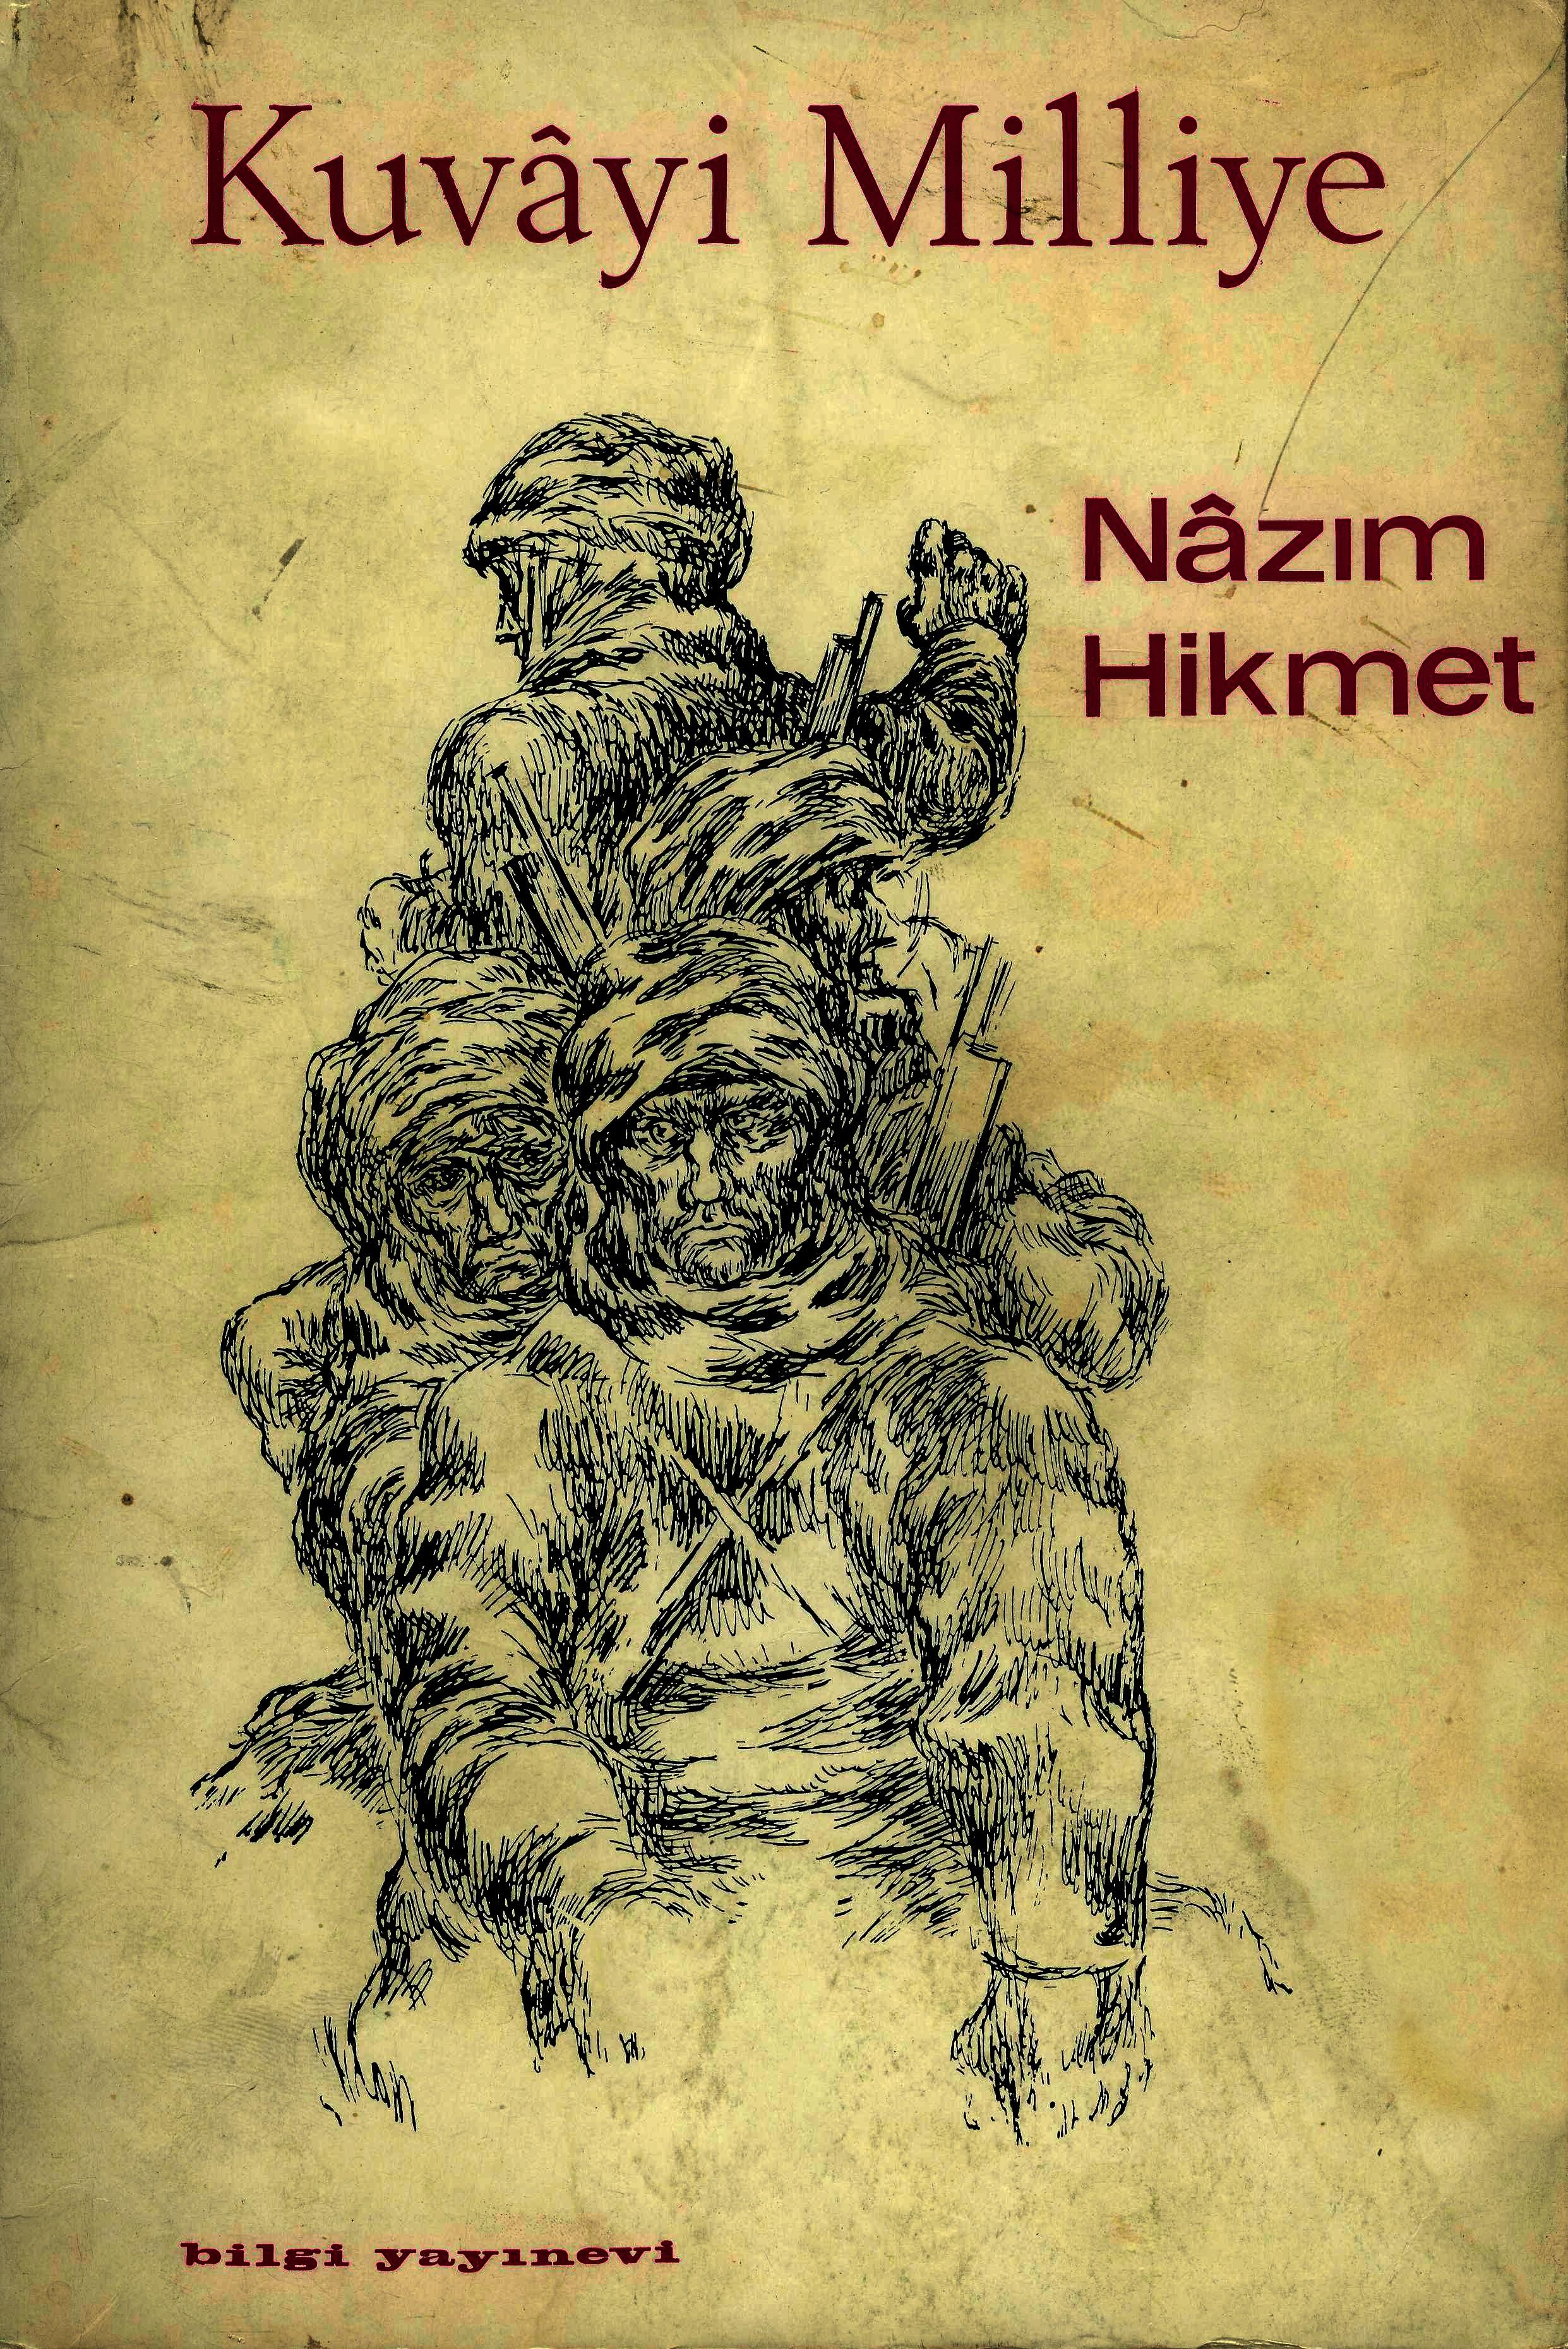 kuvayi-milliye-nazım_hikmet